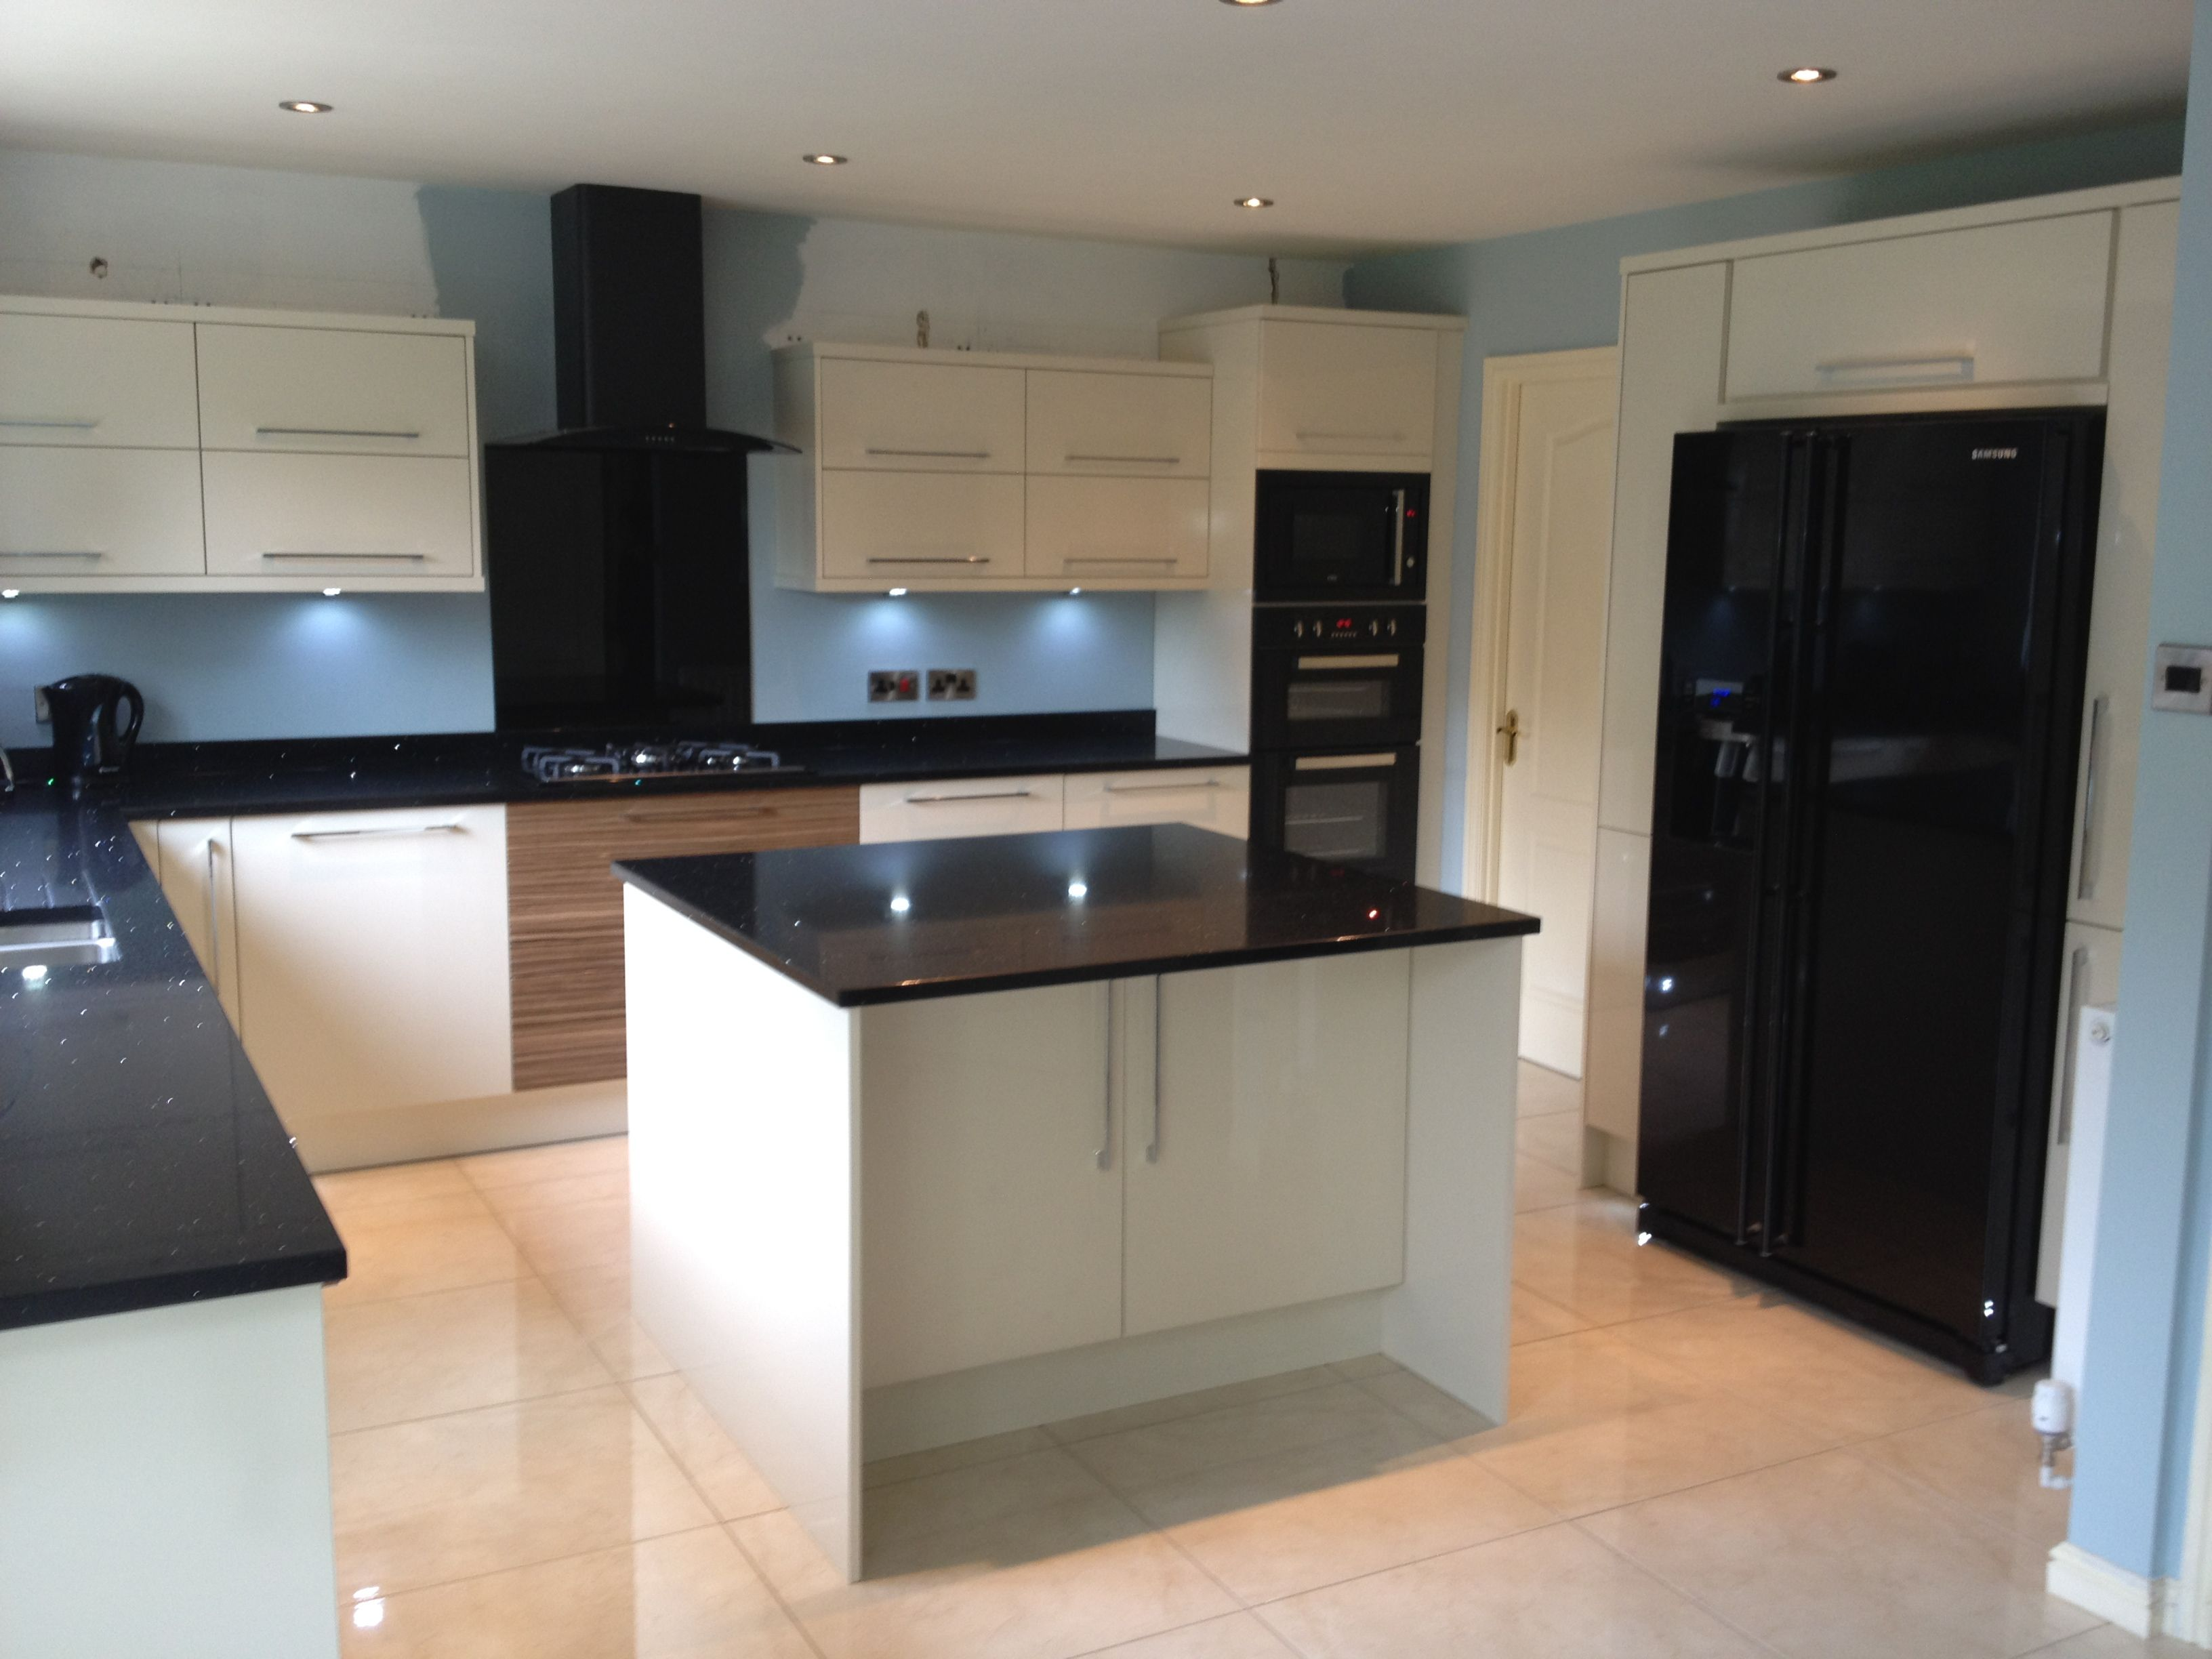 Best Interior Designers In New York City Ny Metro Area White Kitchen Remodeling Black Appliances Kitchen Kitchen Remodel